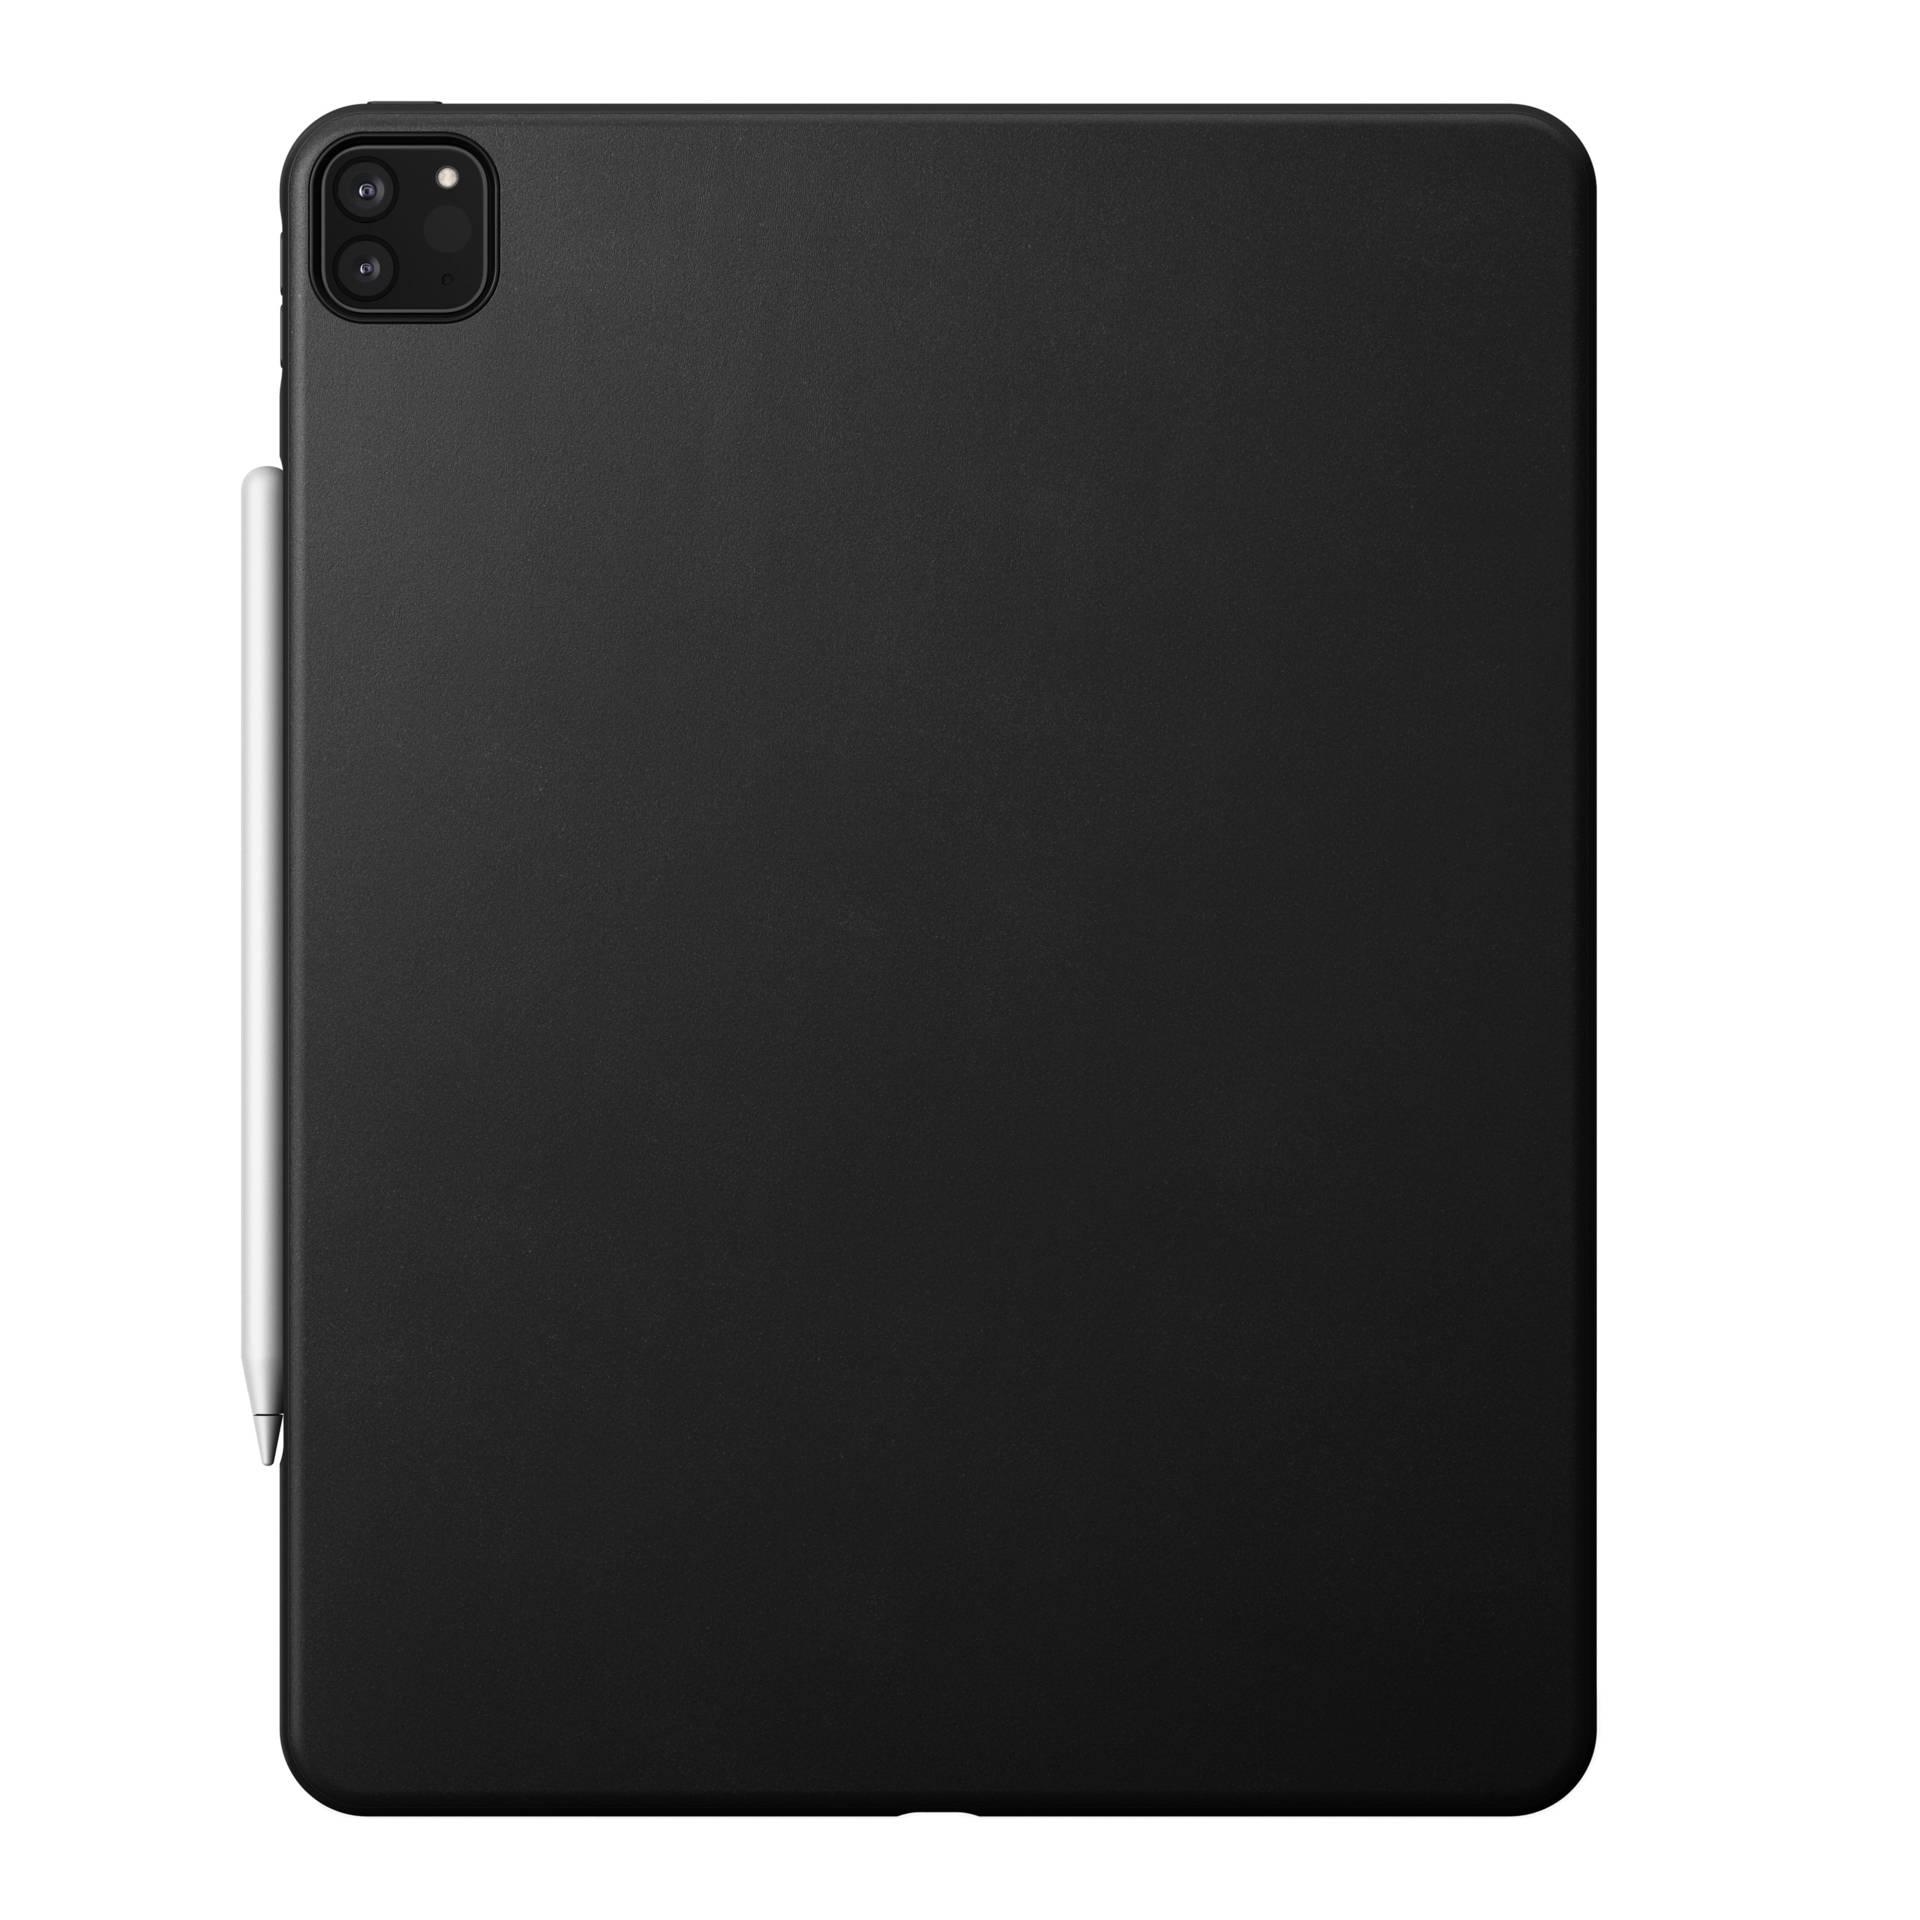 "Nomad Rugged Leather Case für iPad Pro 12,9"" Black"